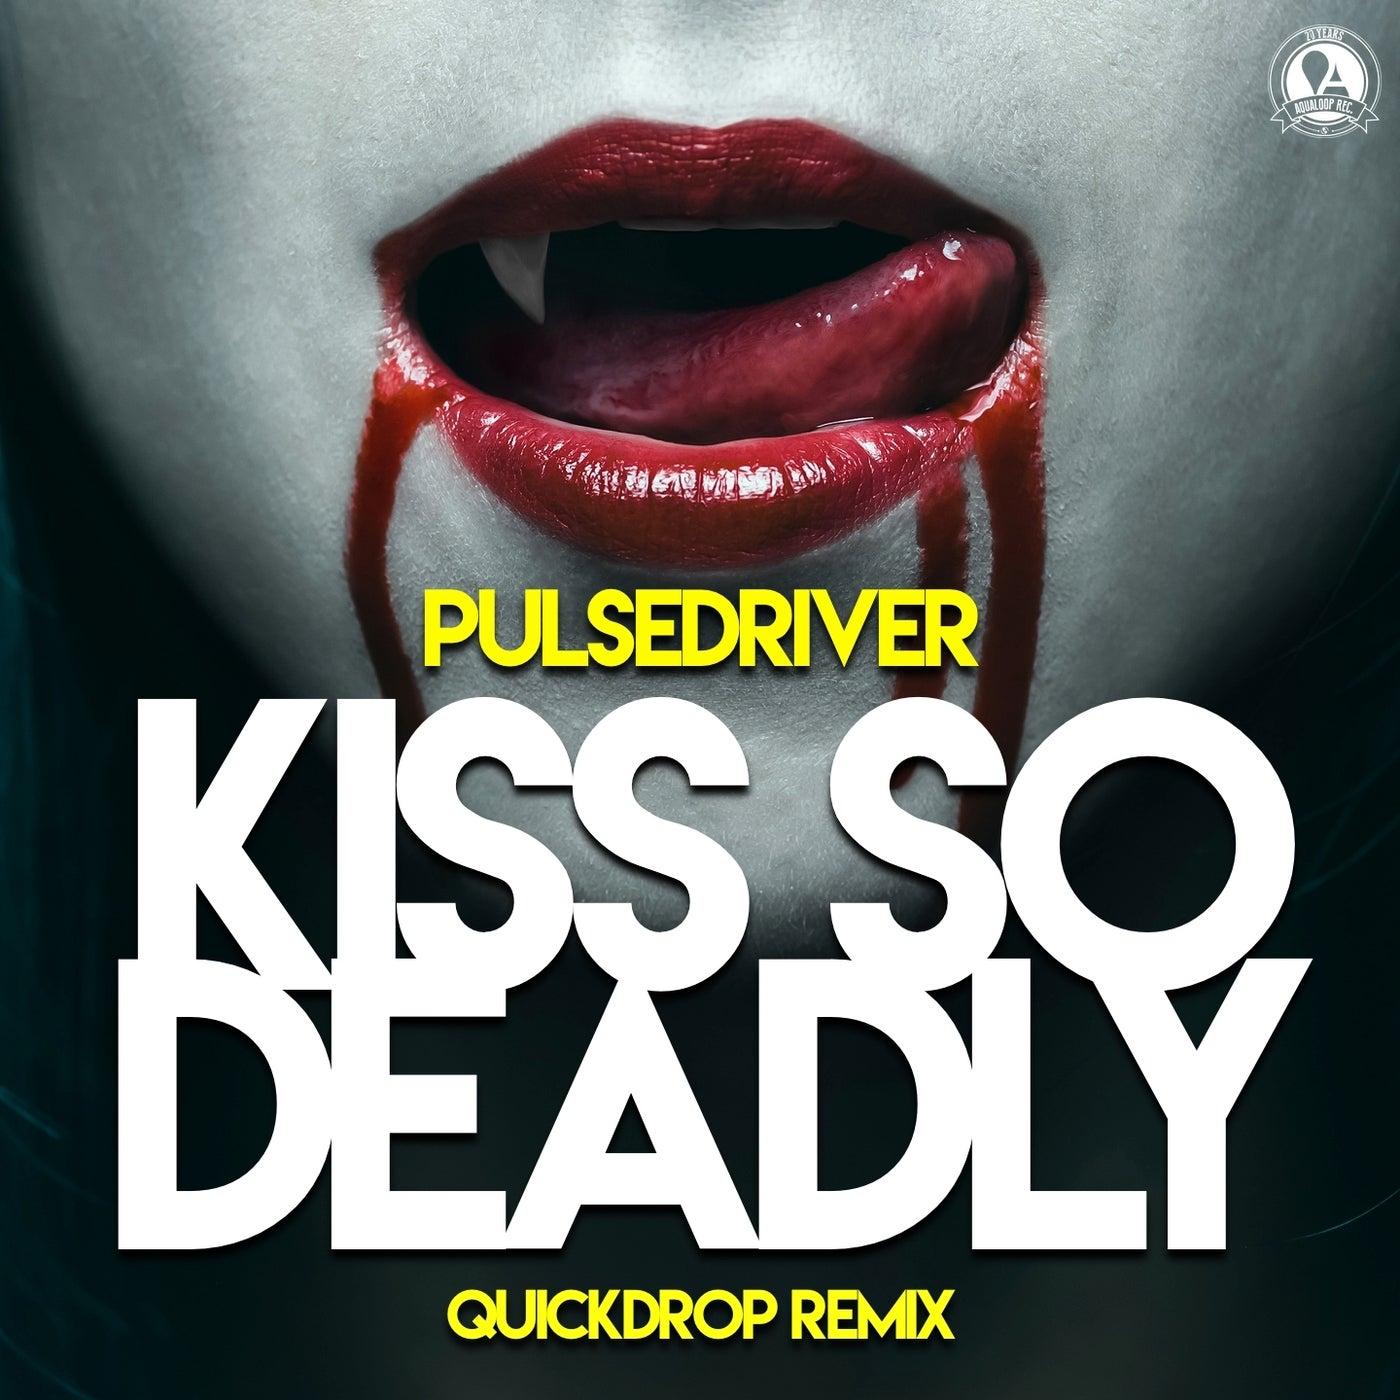 Kiss so Deadly